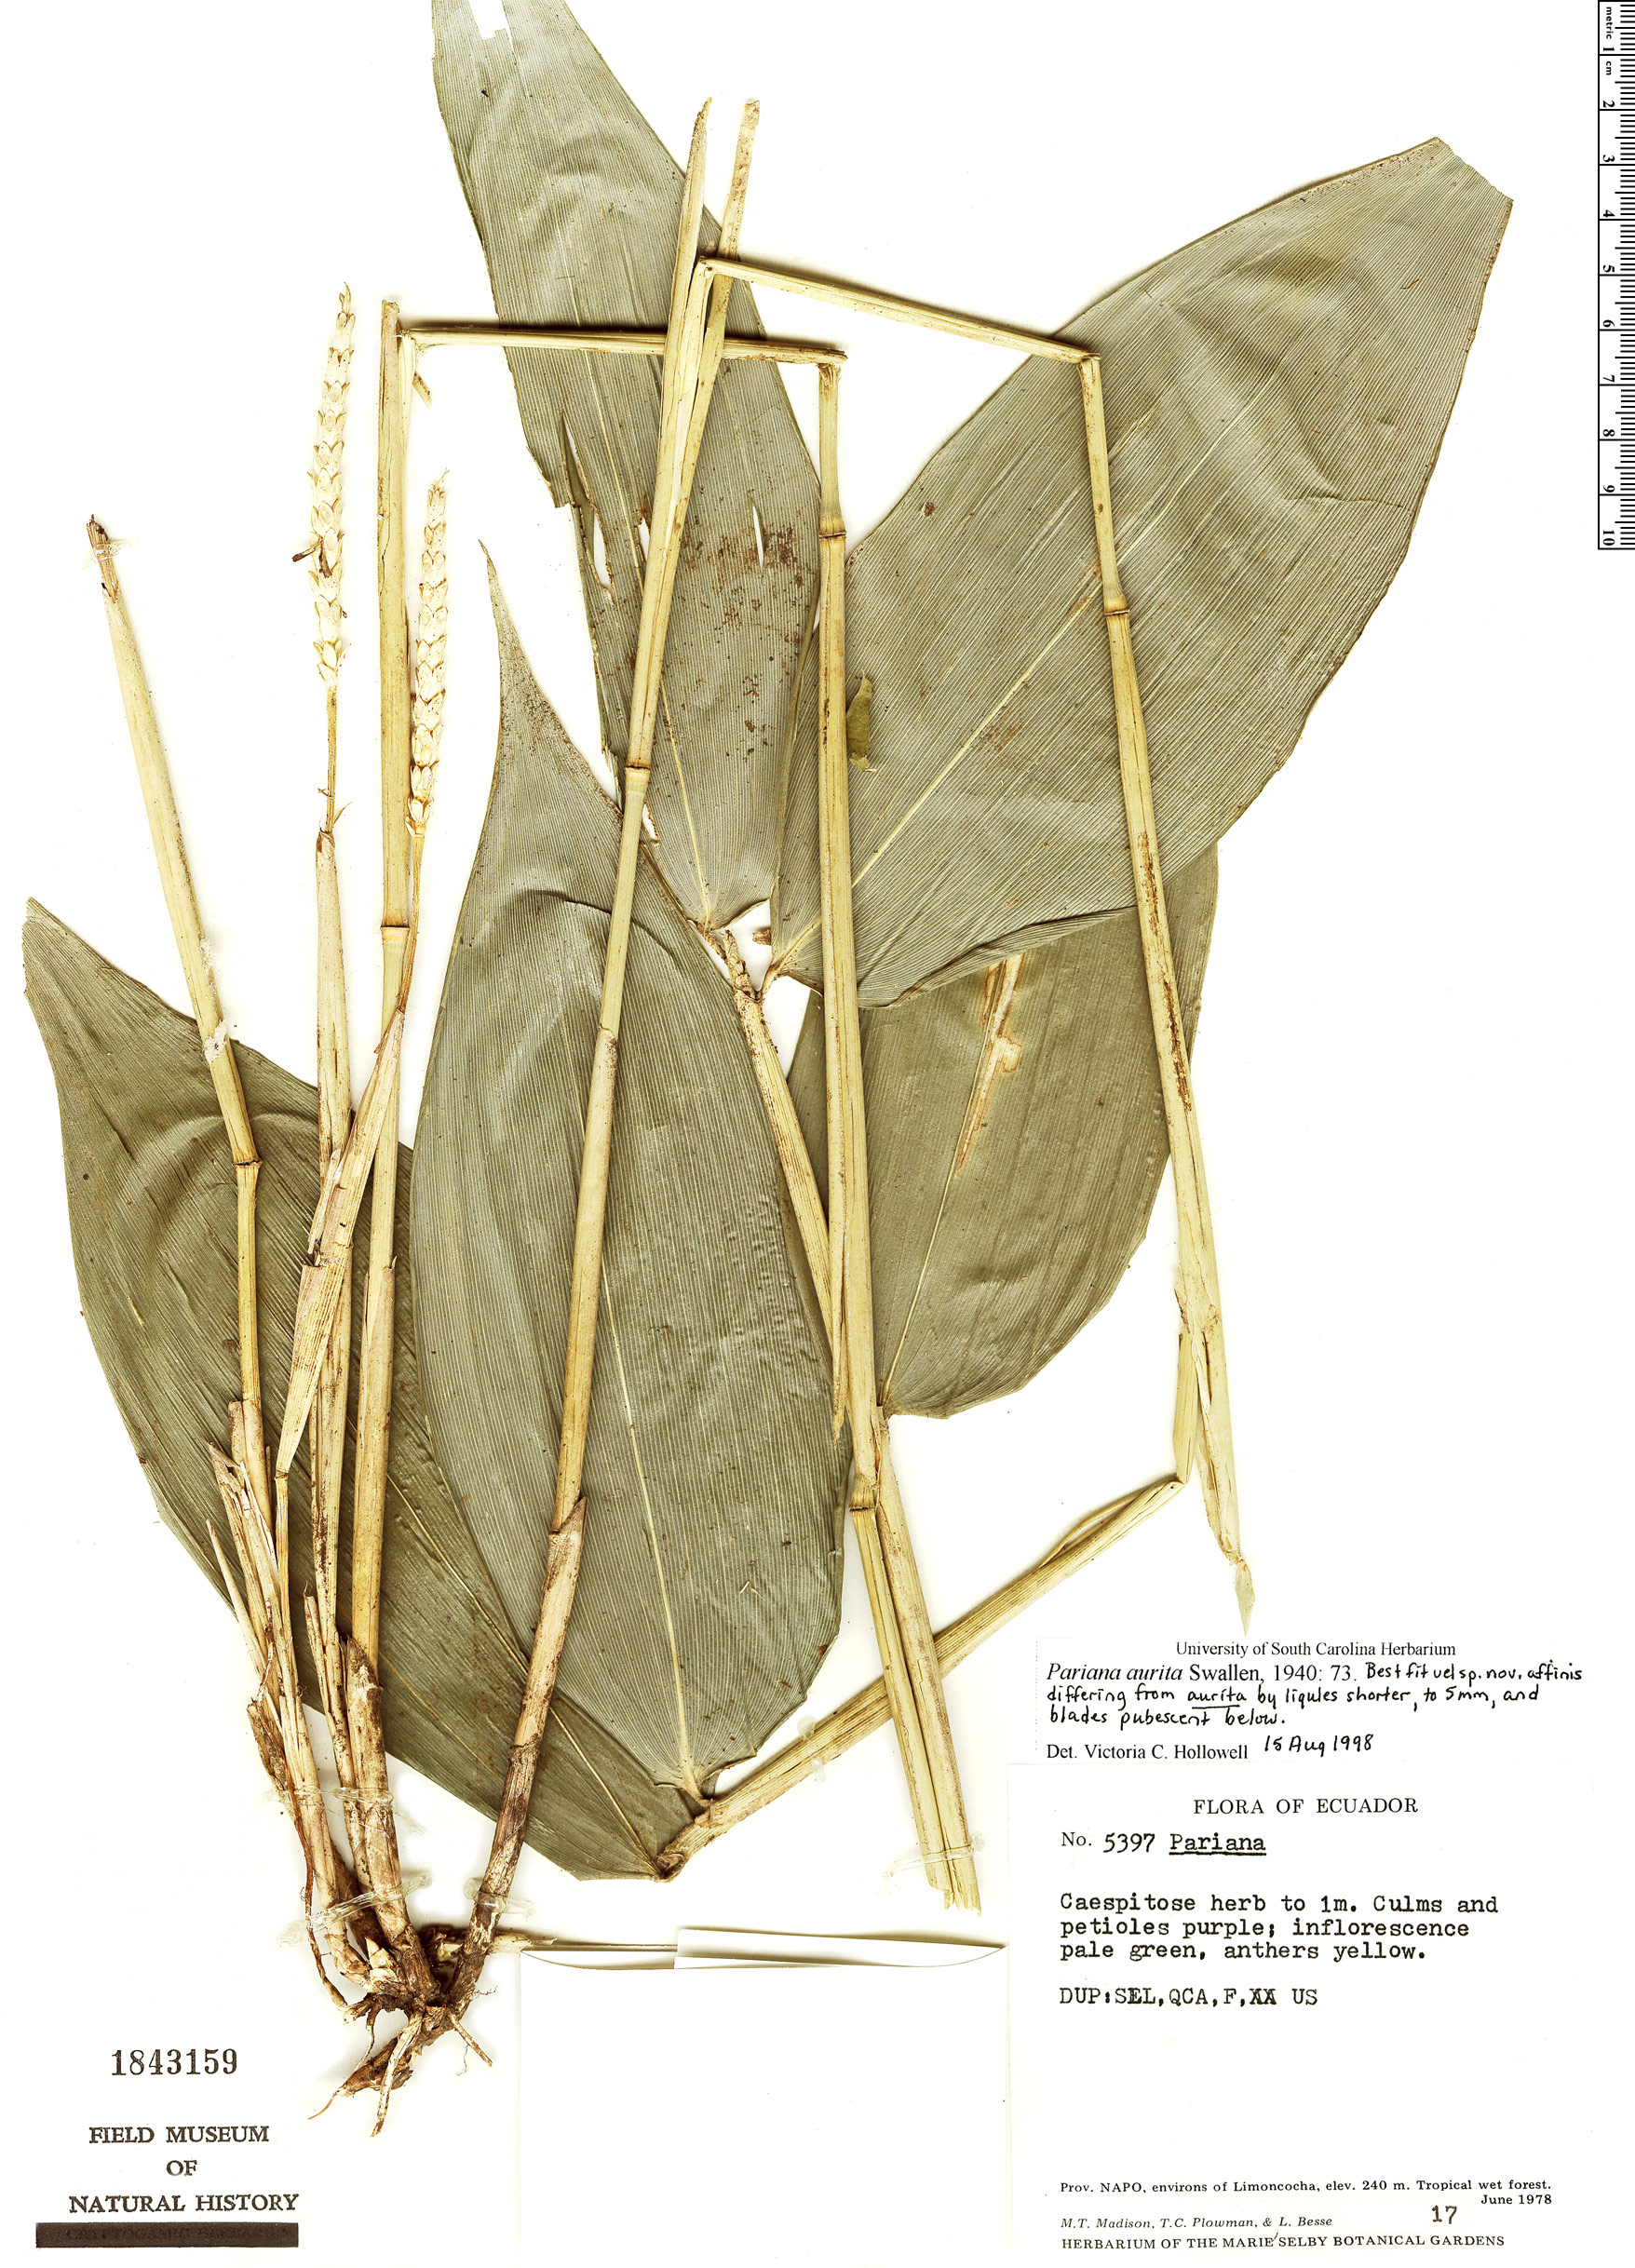 Espécime: Pariana aurita